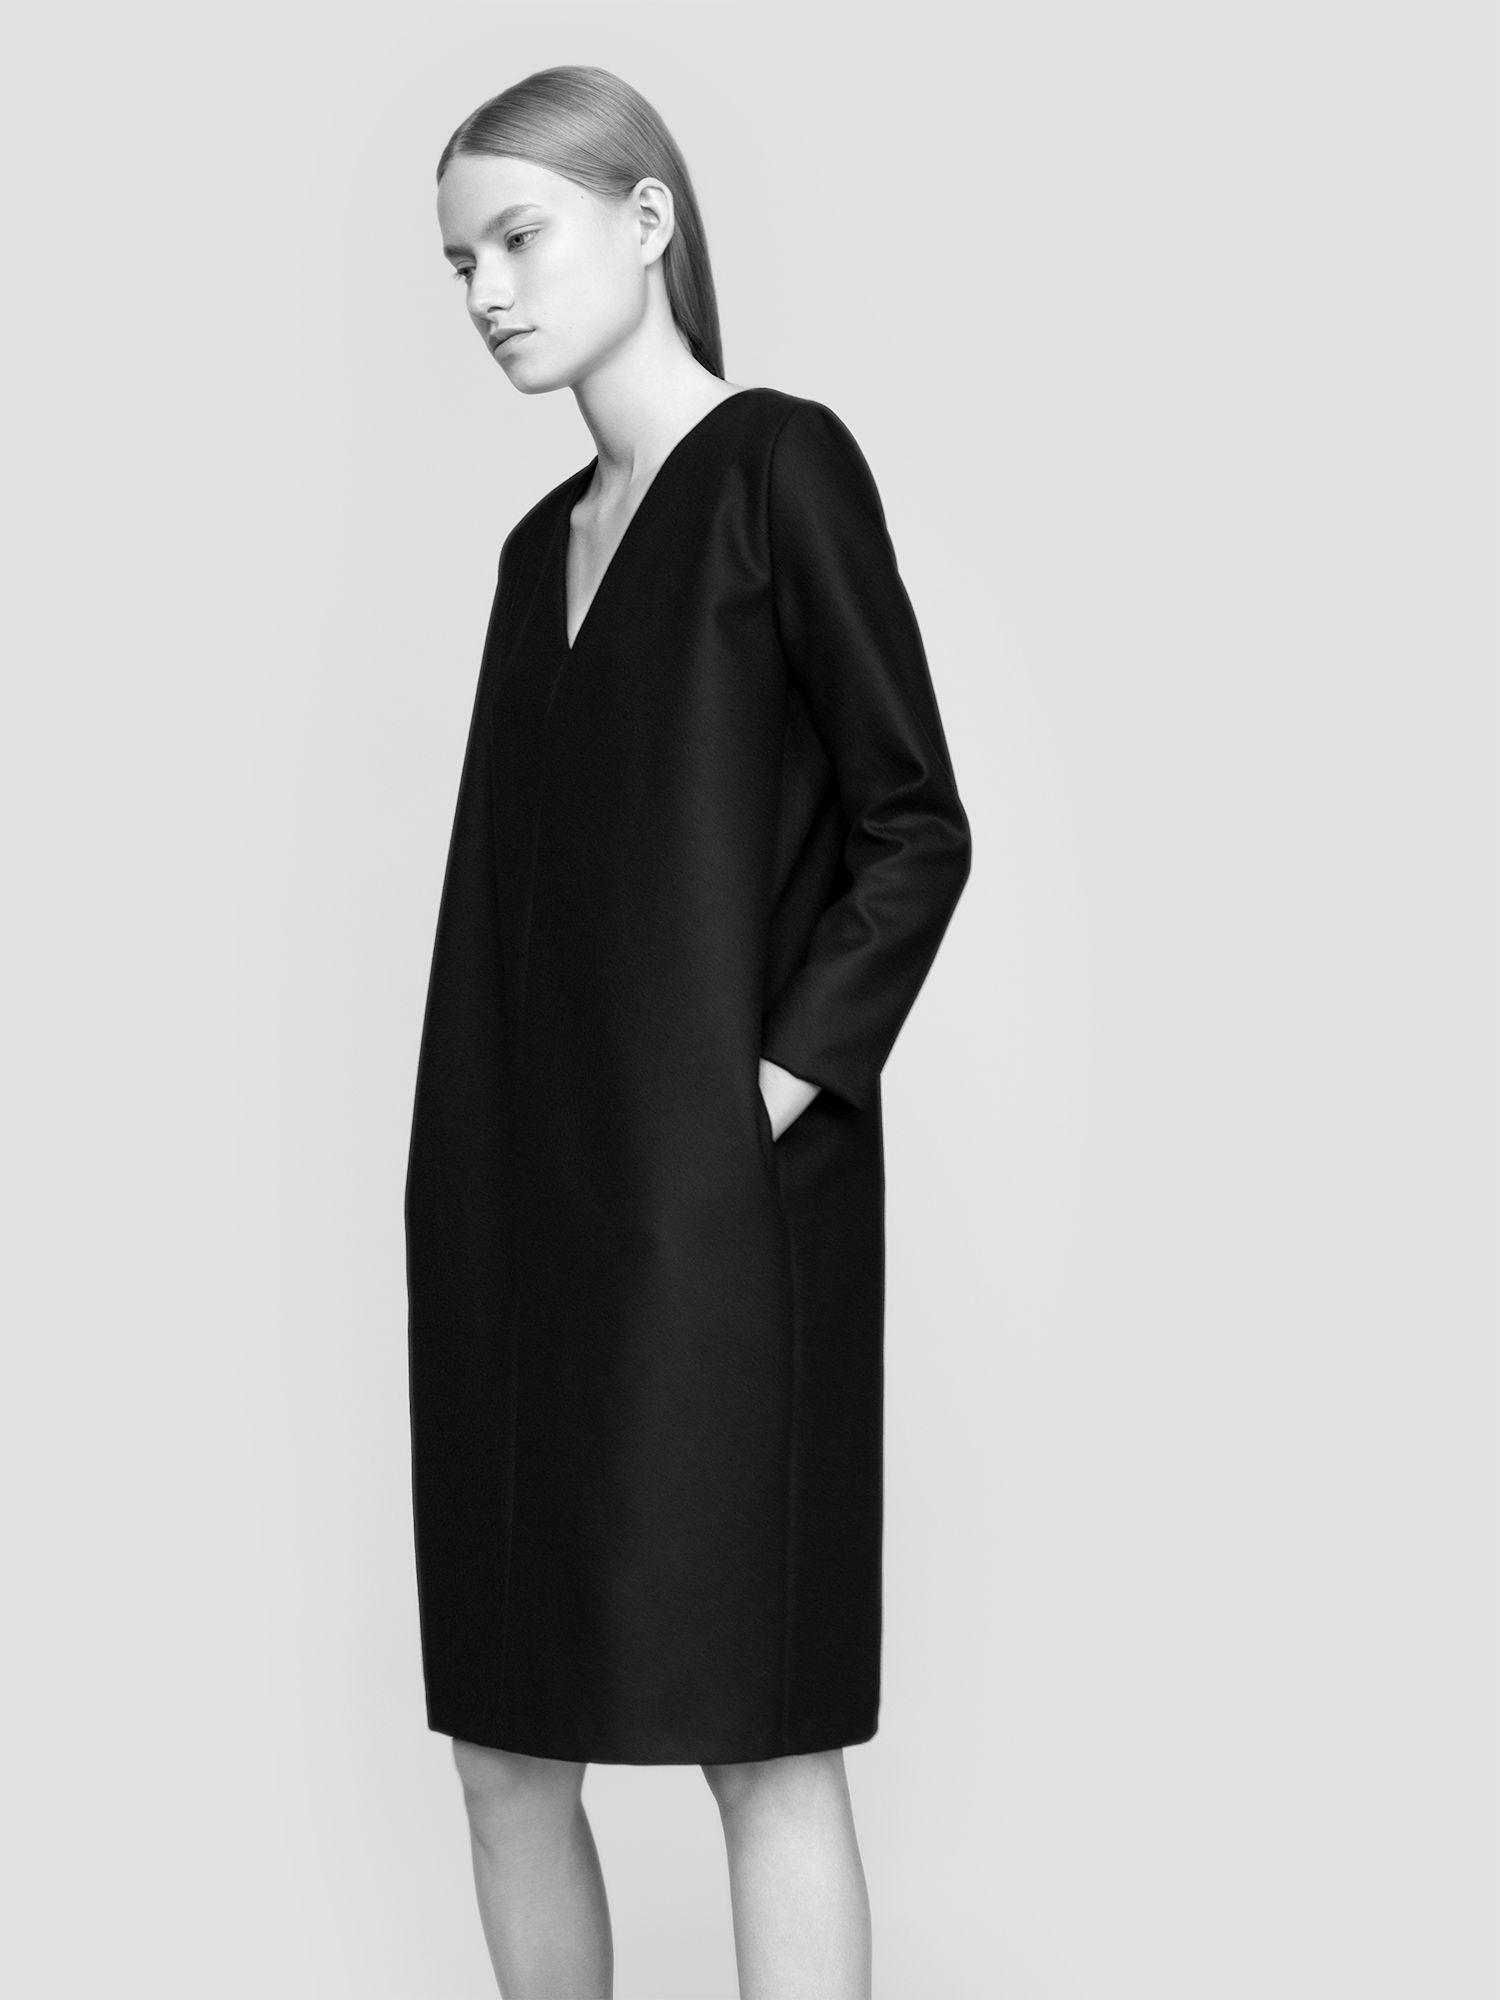 MINIMAL + CLASSIC: NON dress 100% finest merino wool fabric model Malwina Garstka Modelplus Photographed by Kasia Bielska thisisnon.com